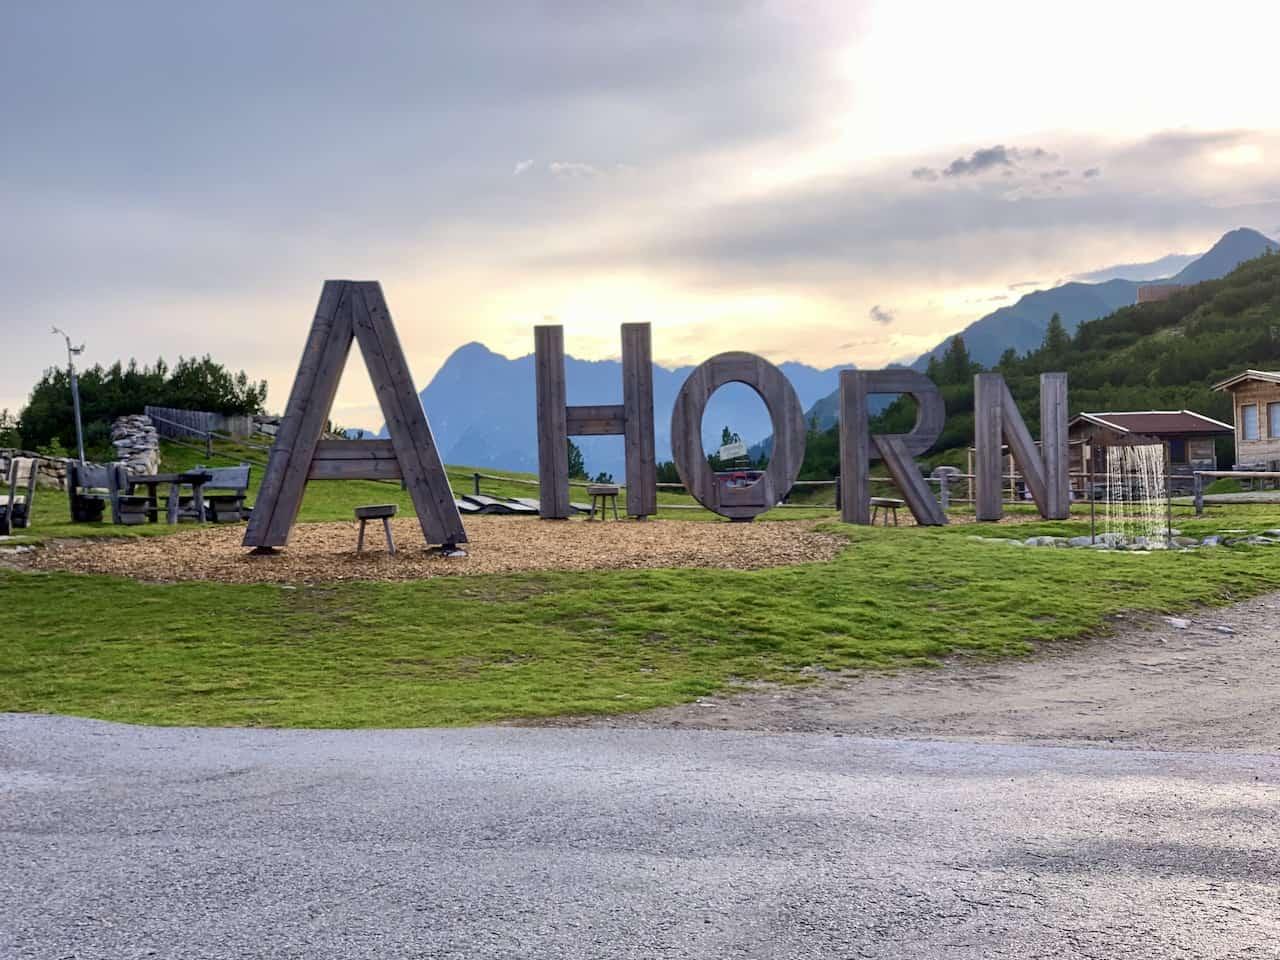 Ahorn Mountain